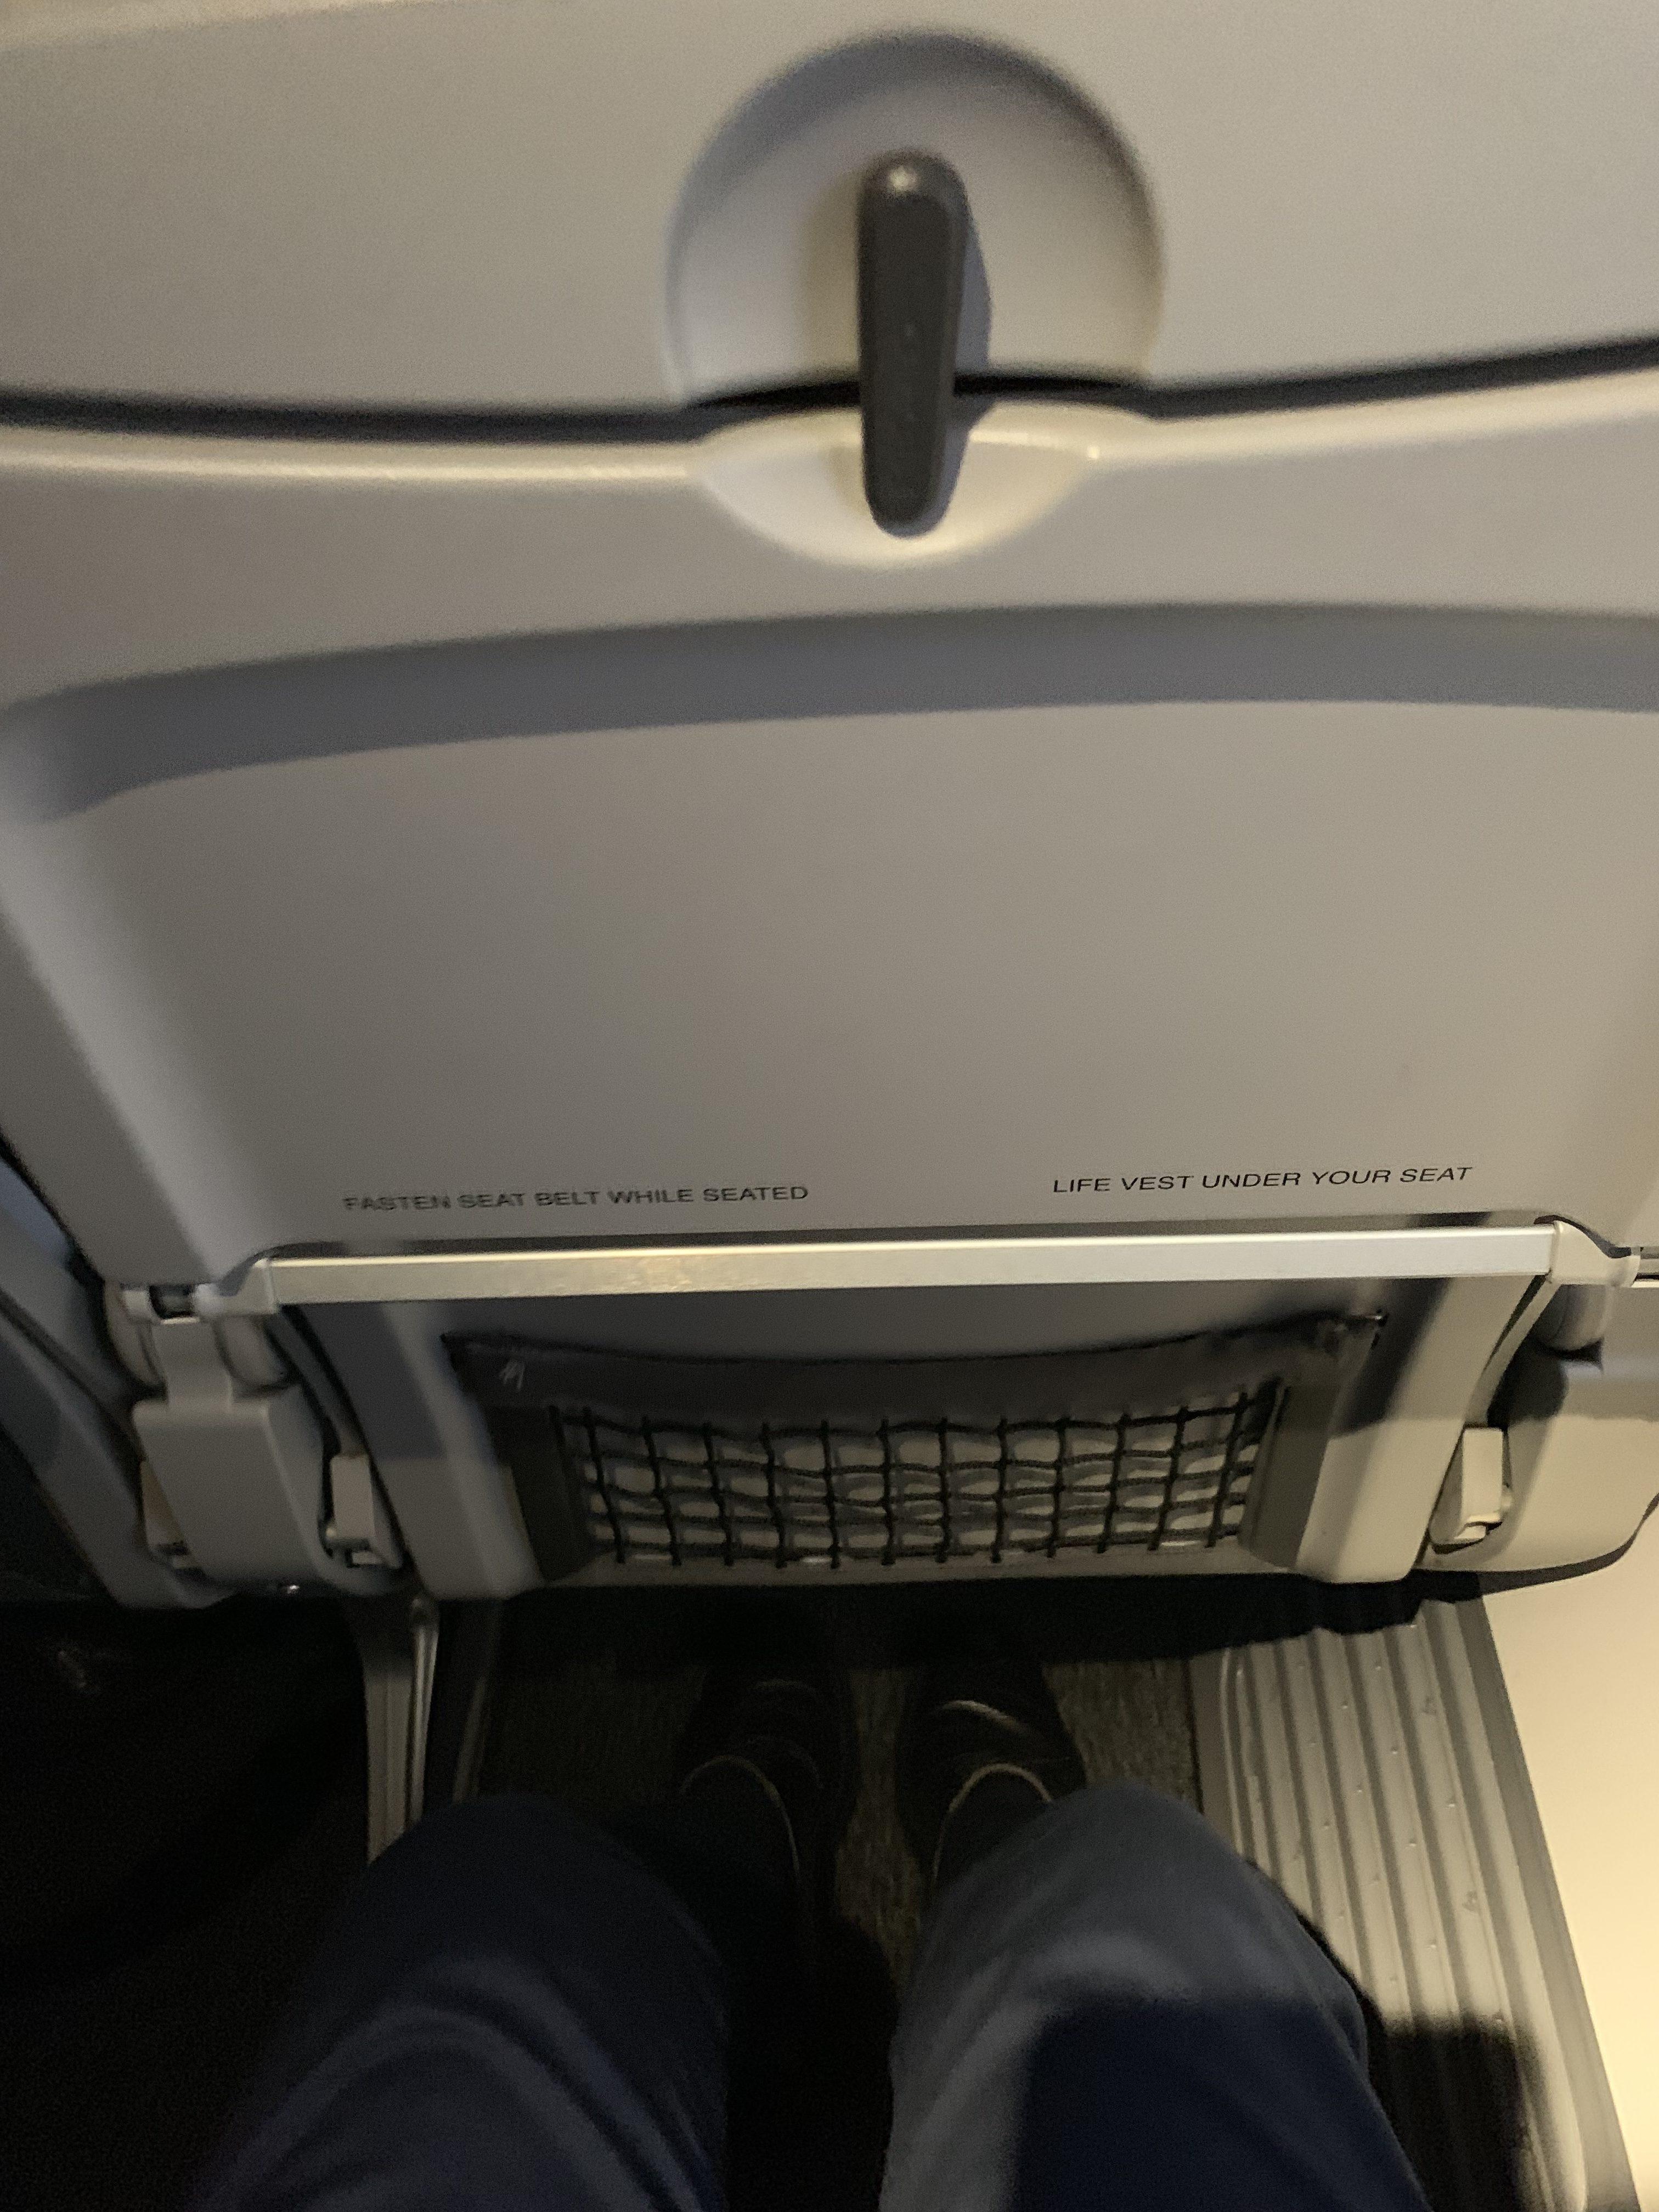 norwegian airlines seating chart Trinity